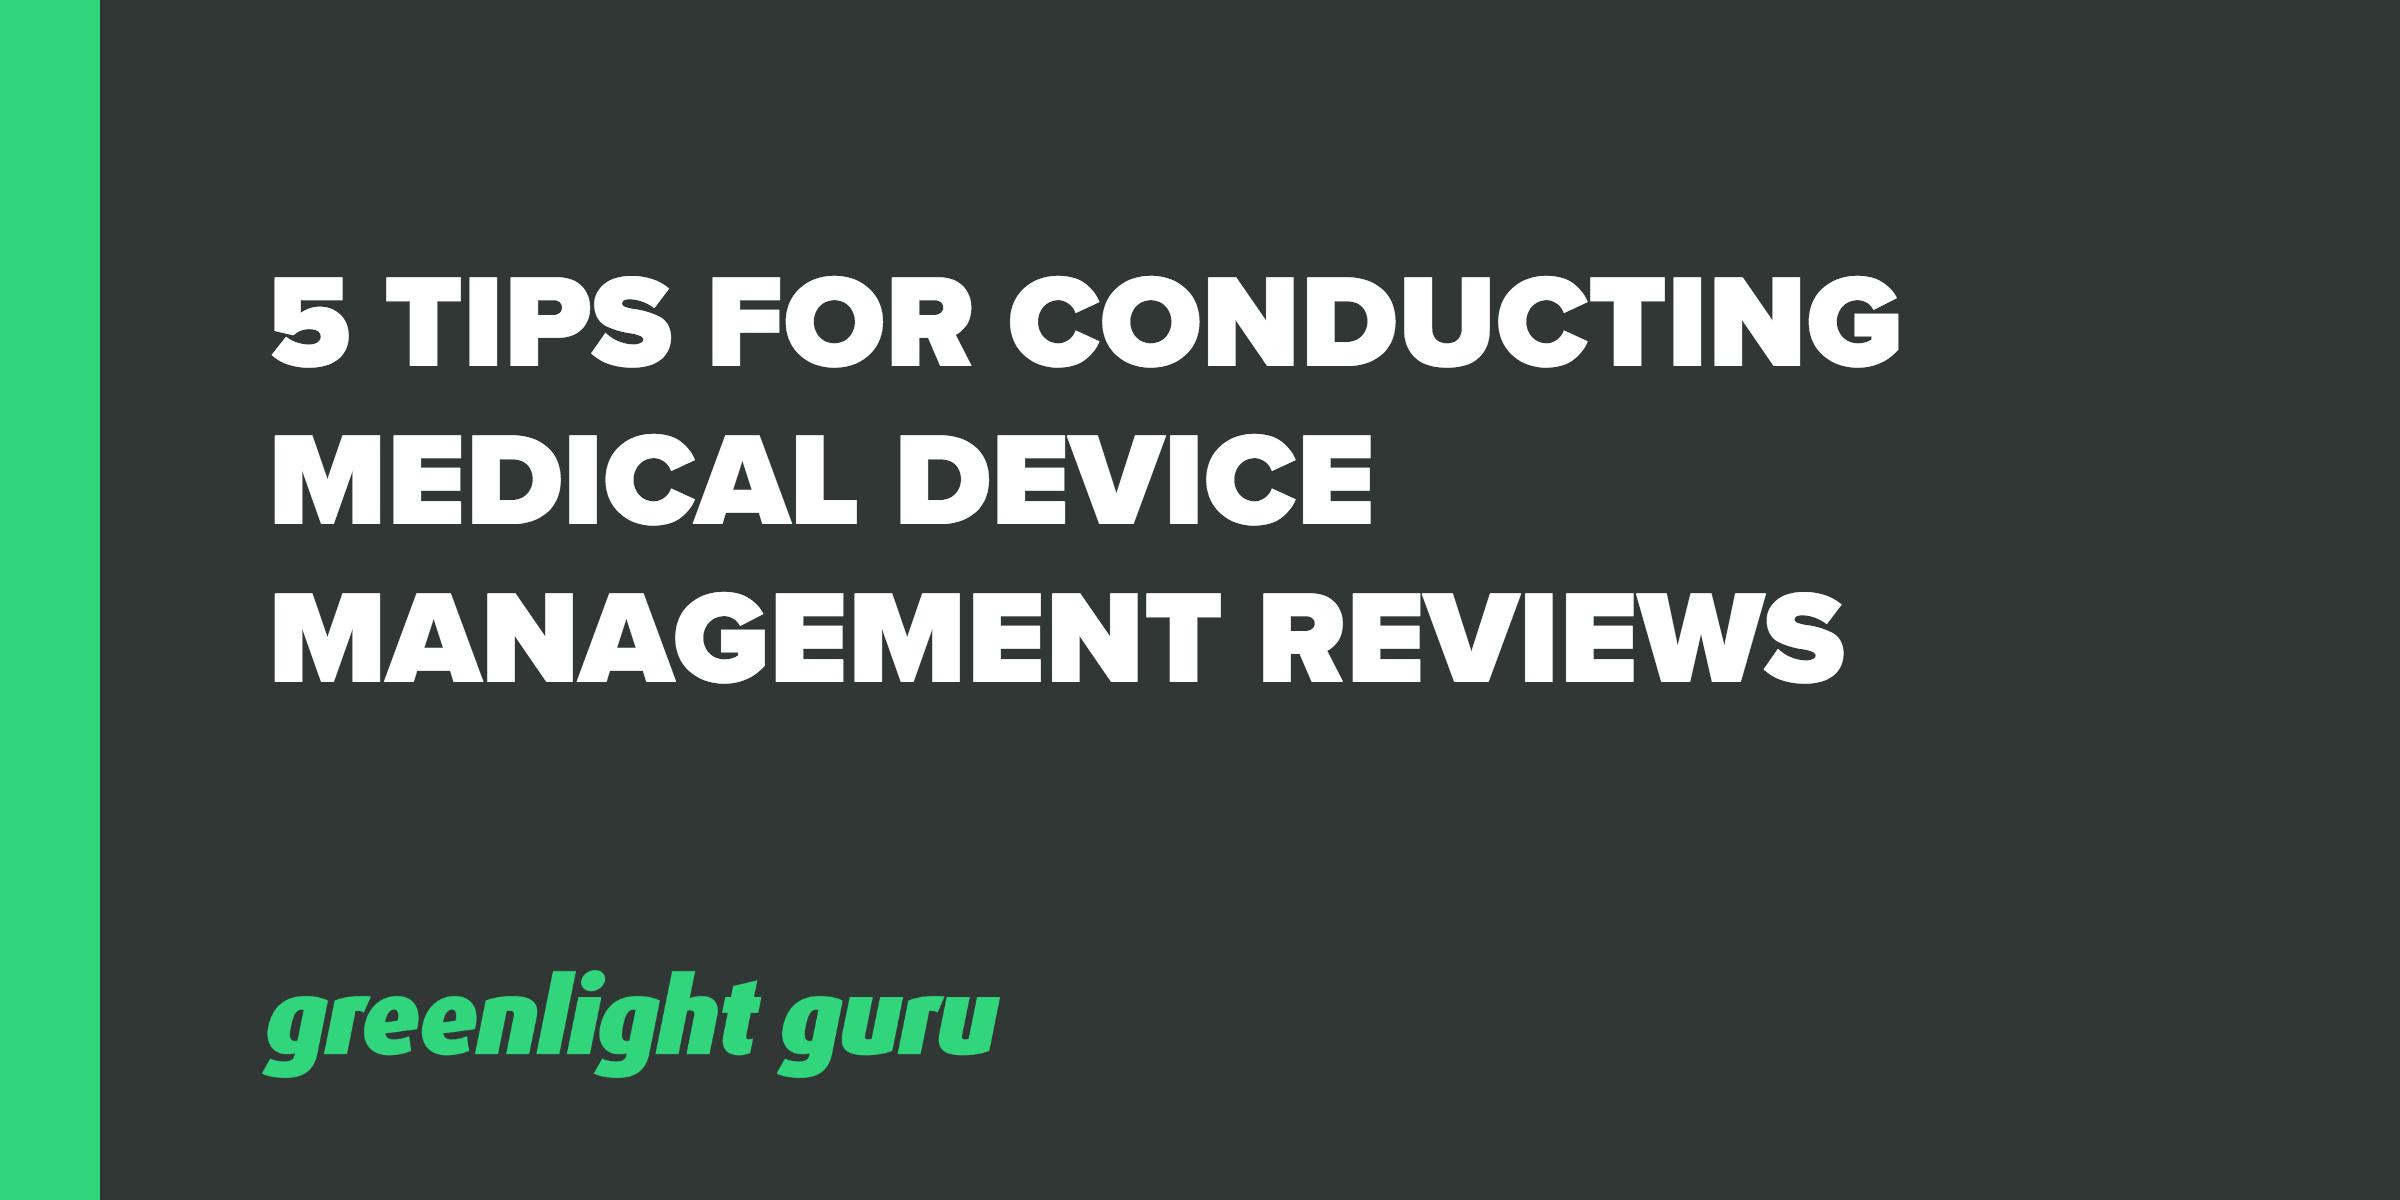 med device management reviews